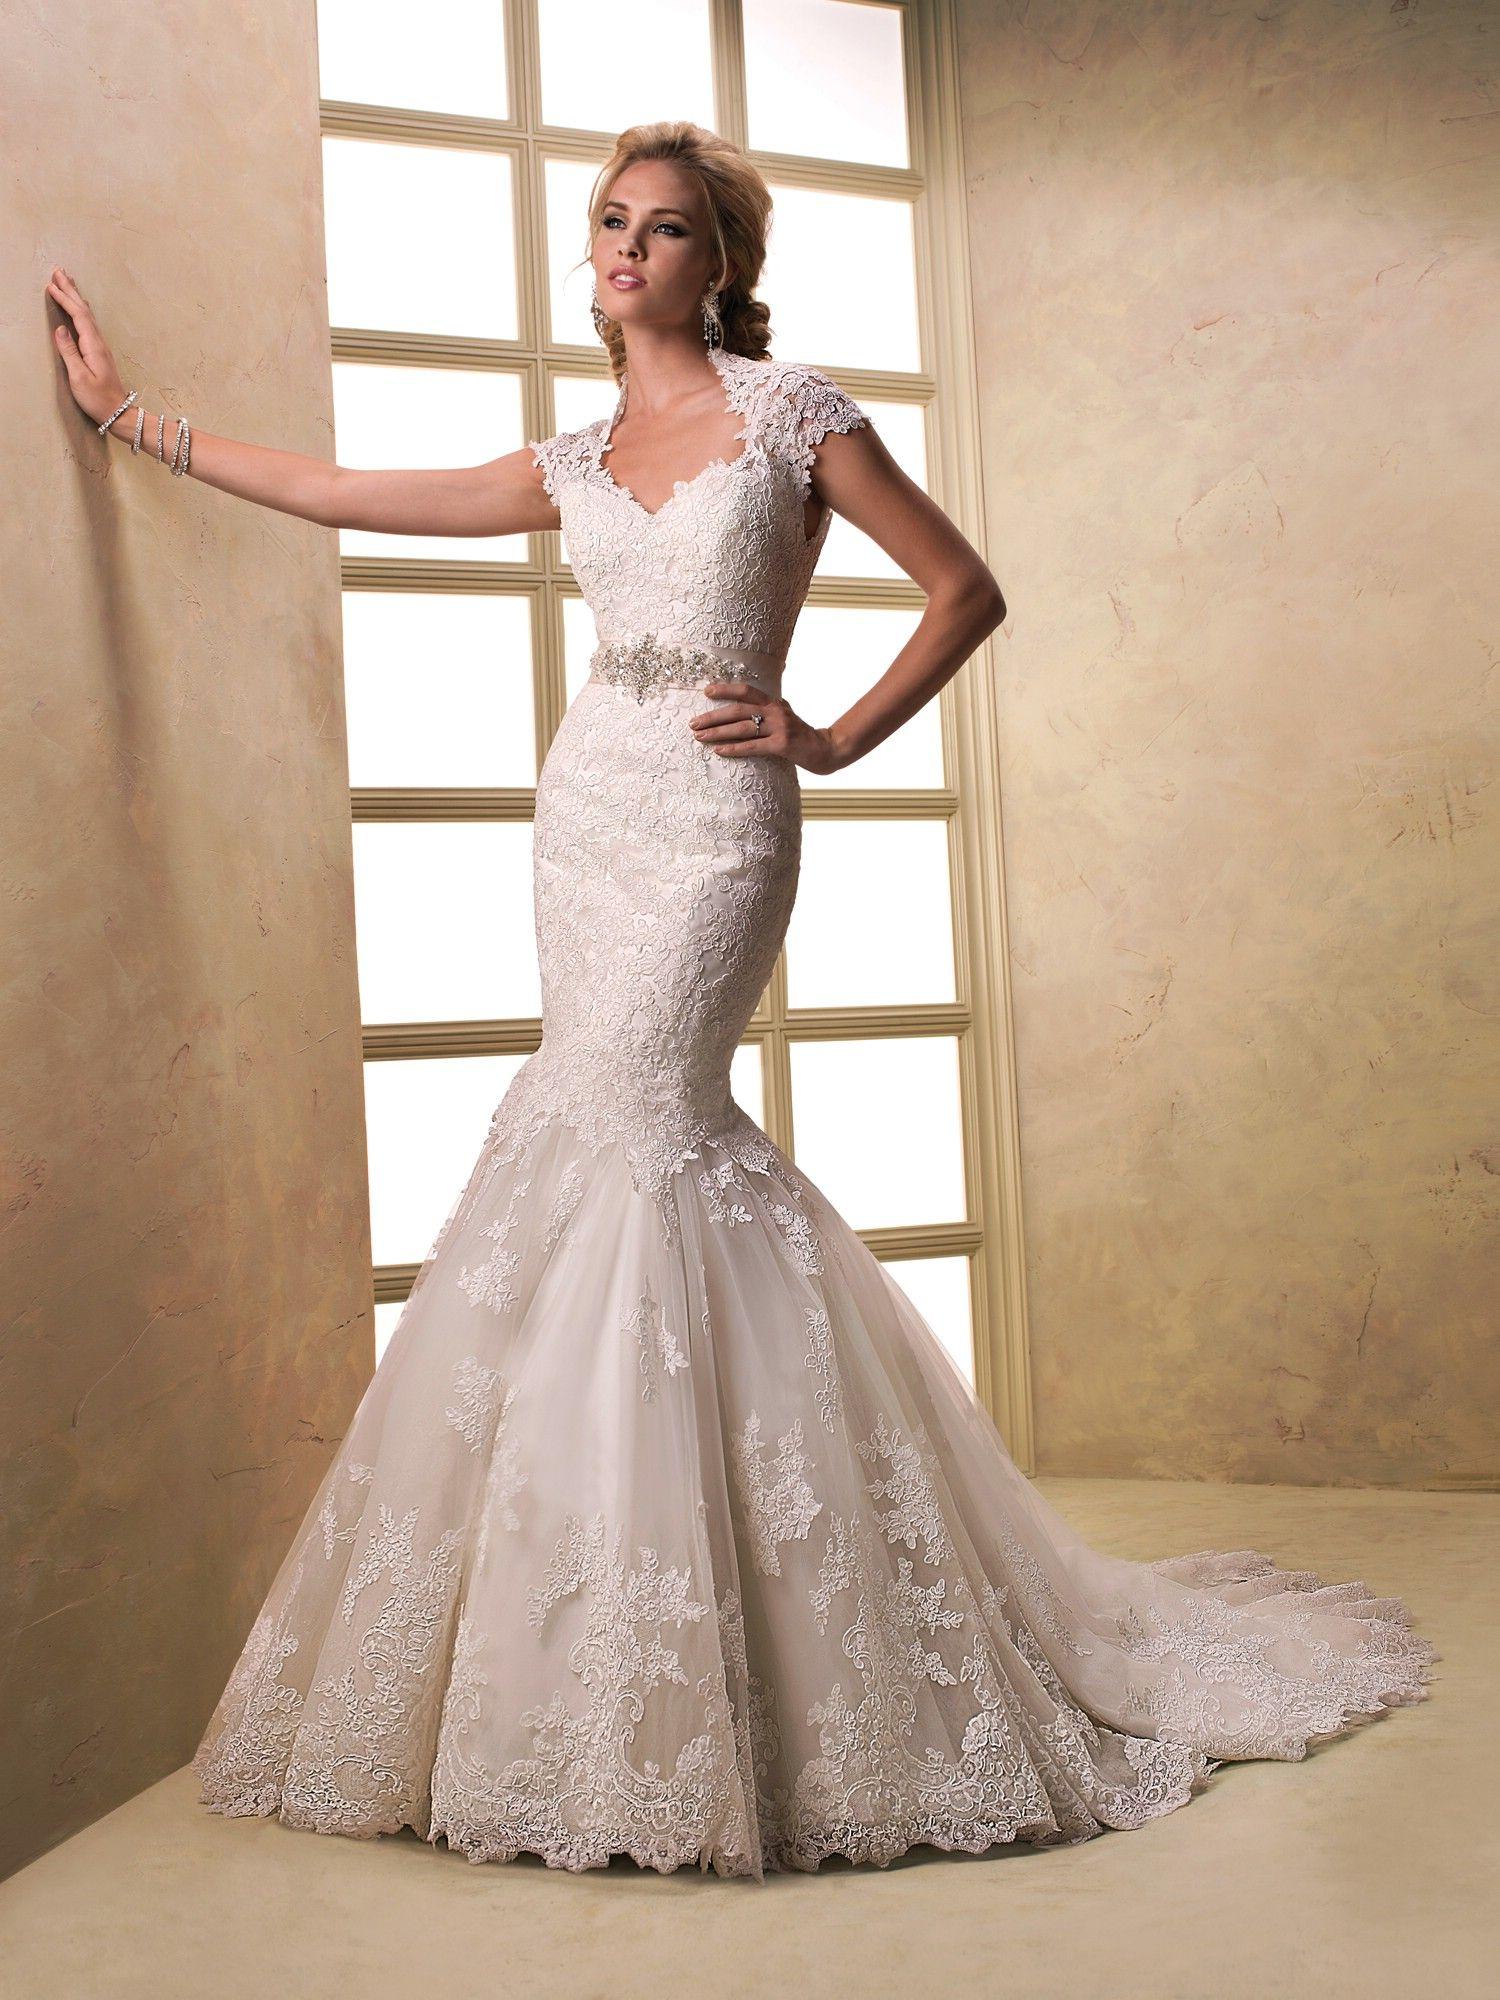 d5245ef3231 Maggie Sottero Wedding Dresses - Style Elliana 22843. Cheaper Caryn dress